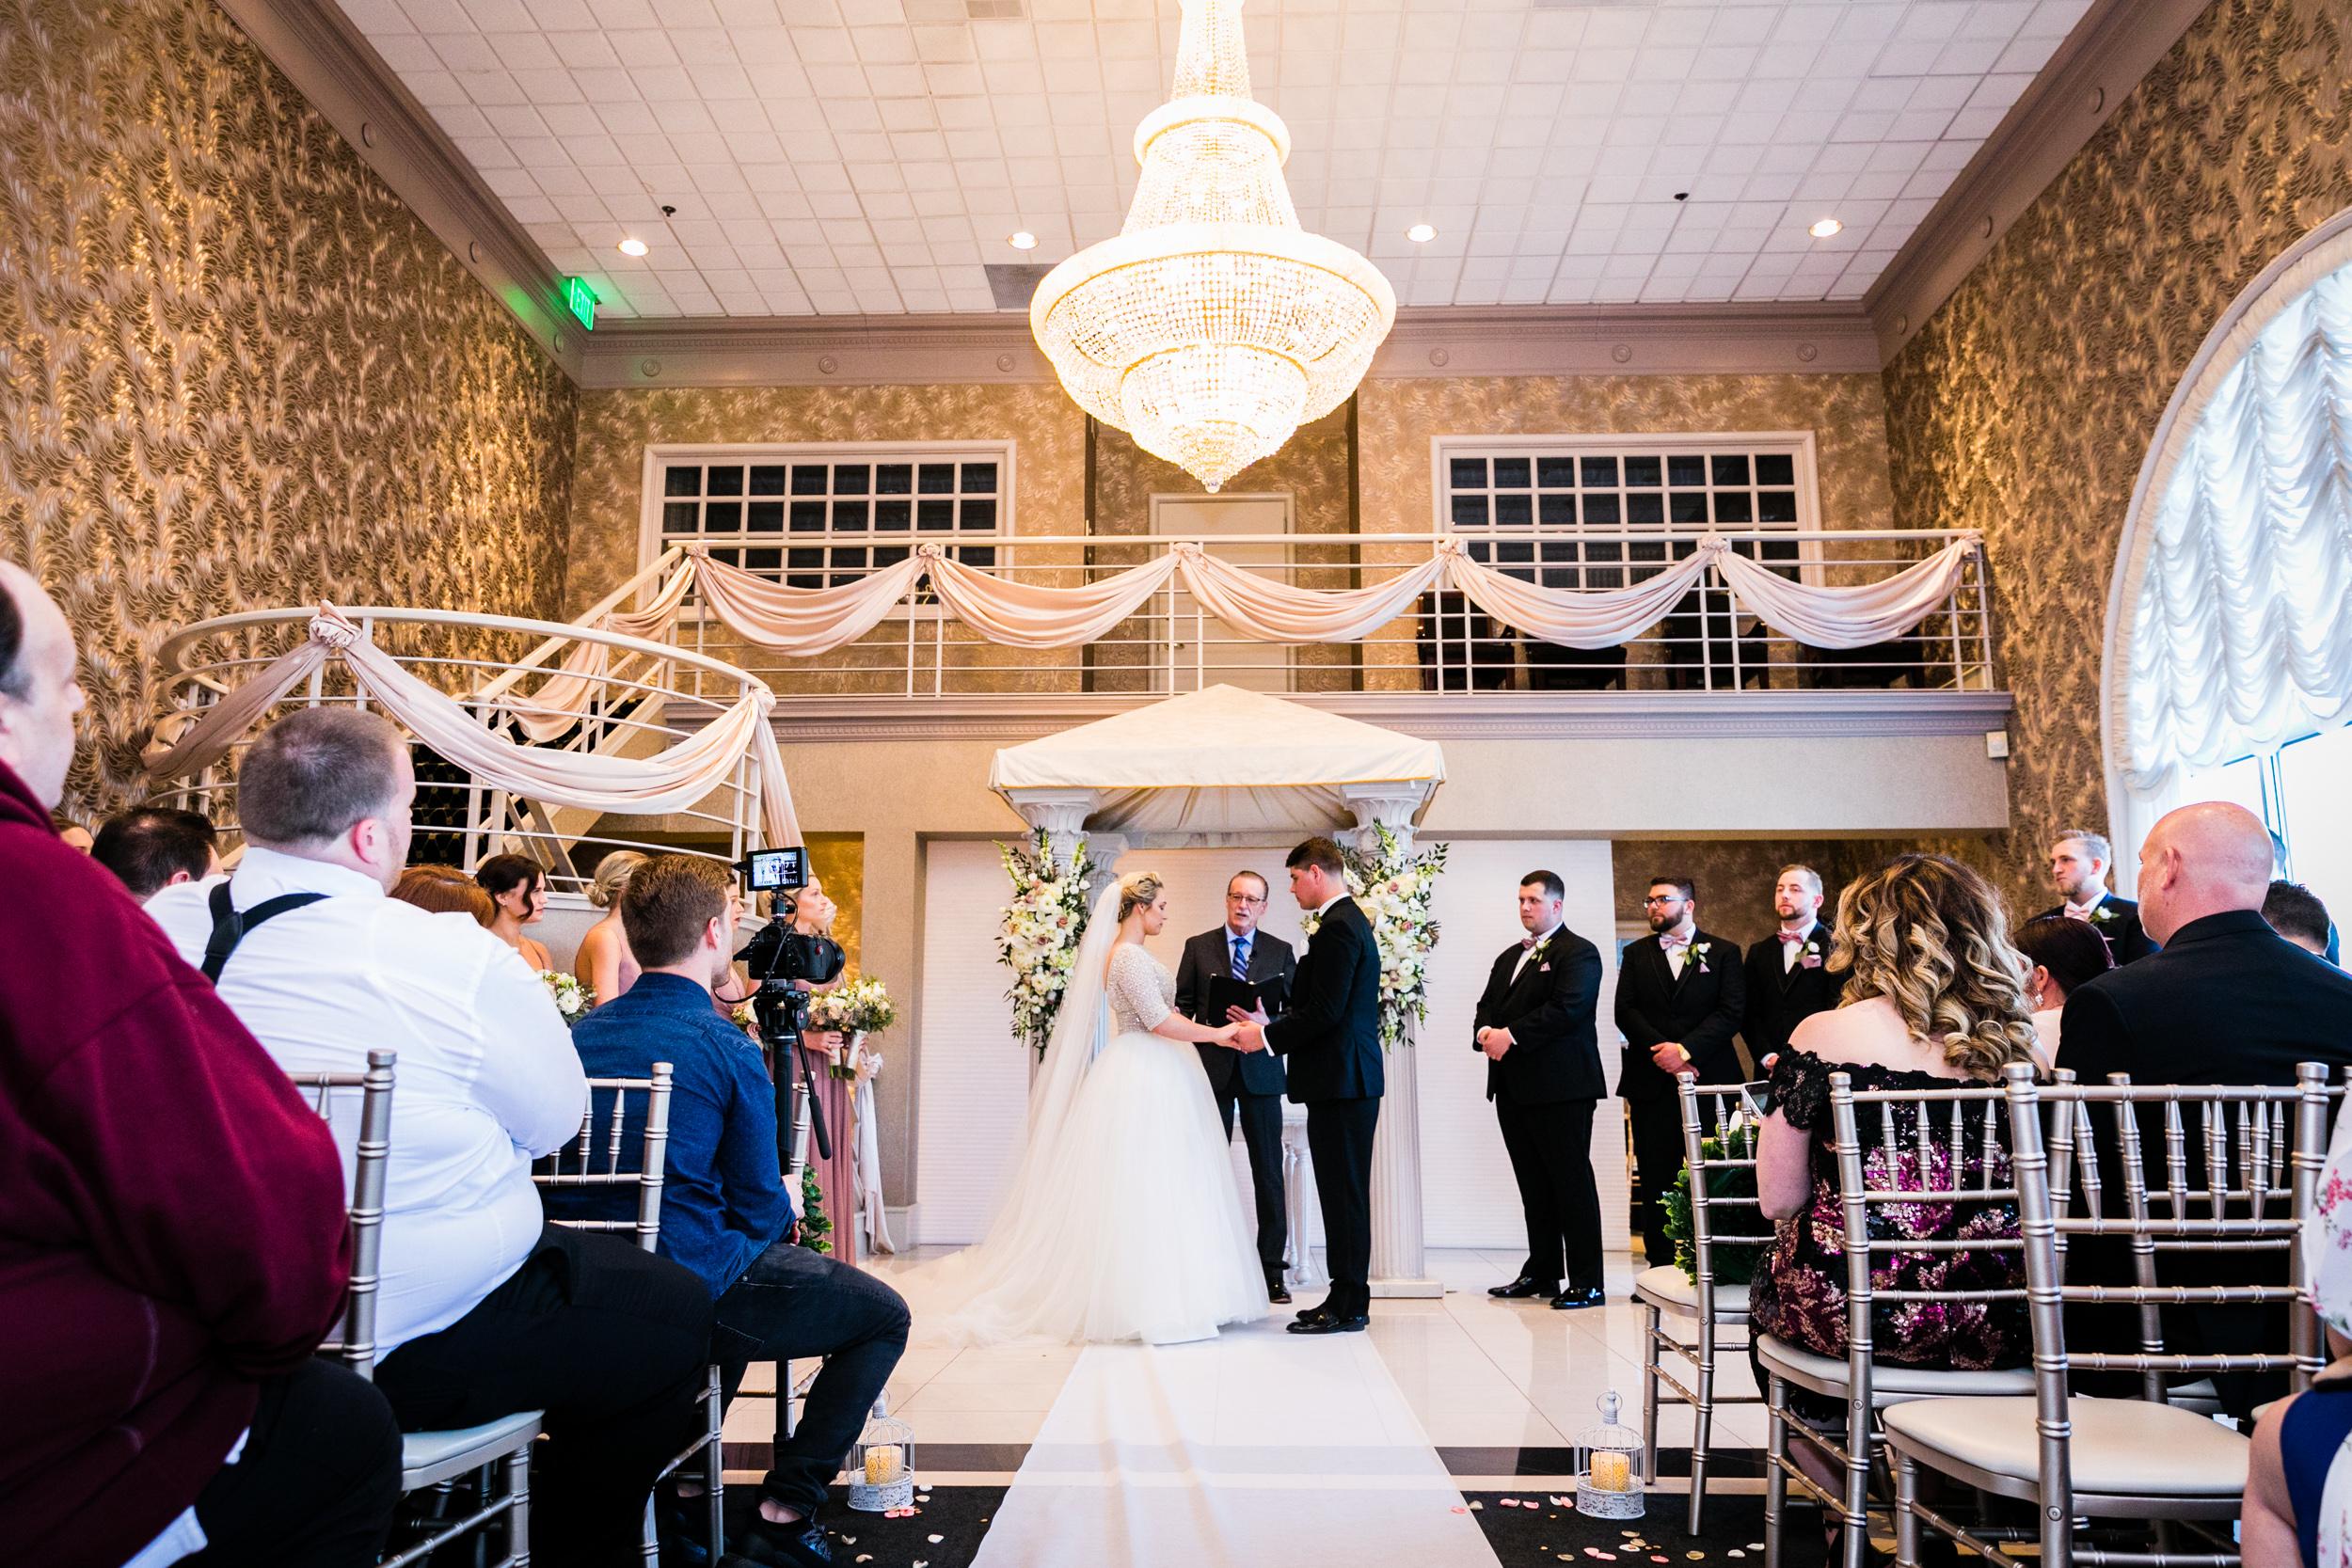 CELEBRATIONS BENSALEM WEDDING PHOTOGRAPHY-50.jpg